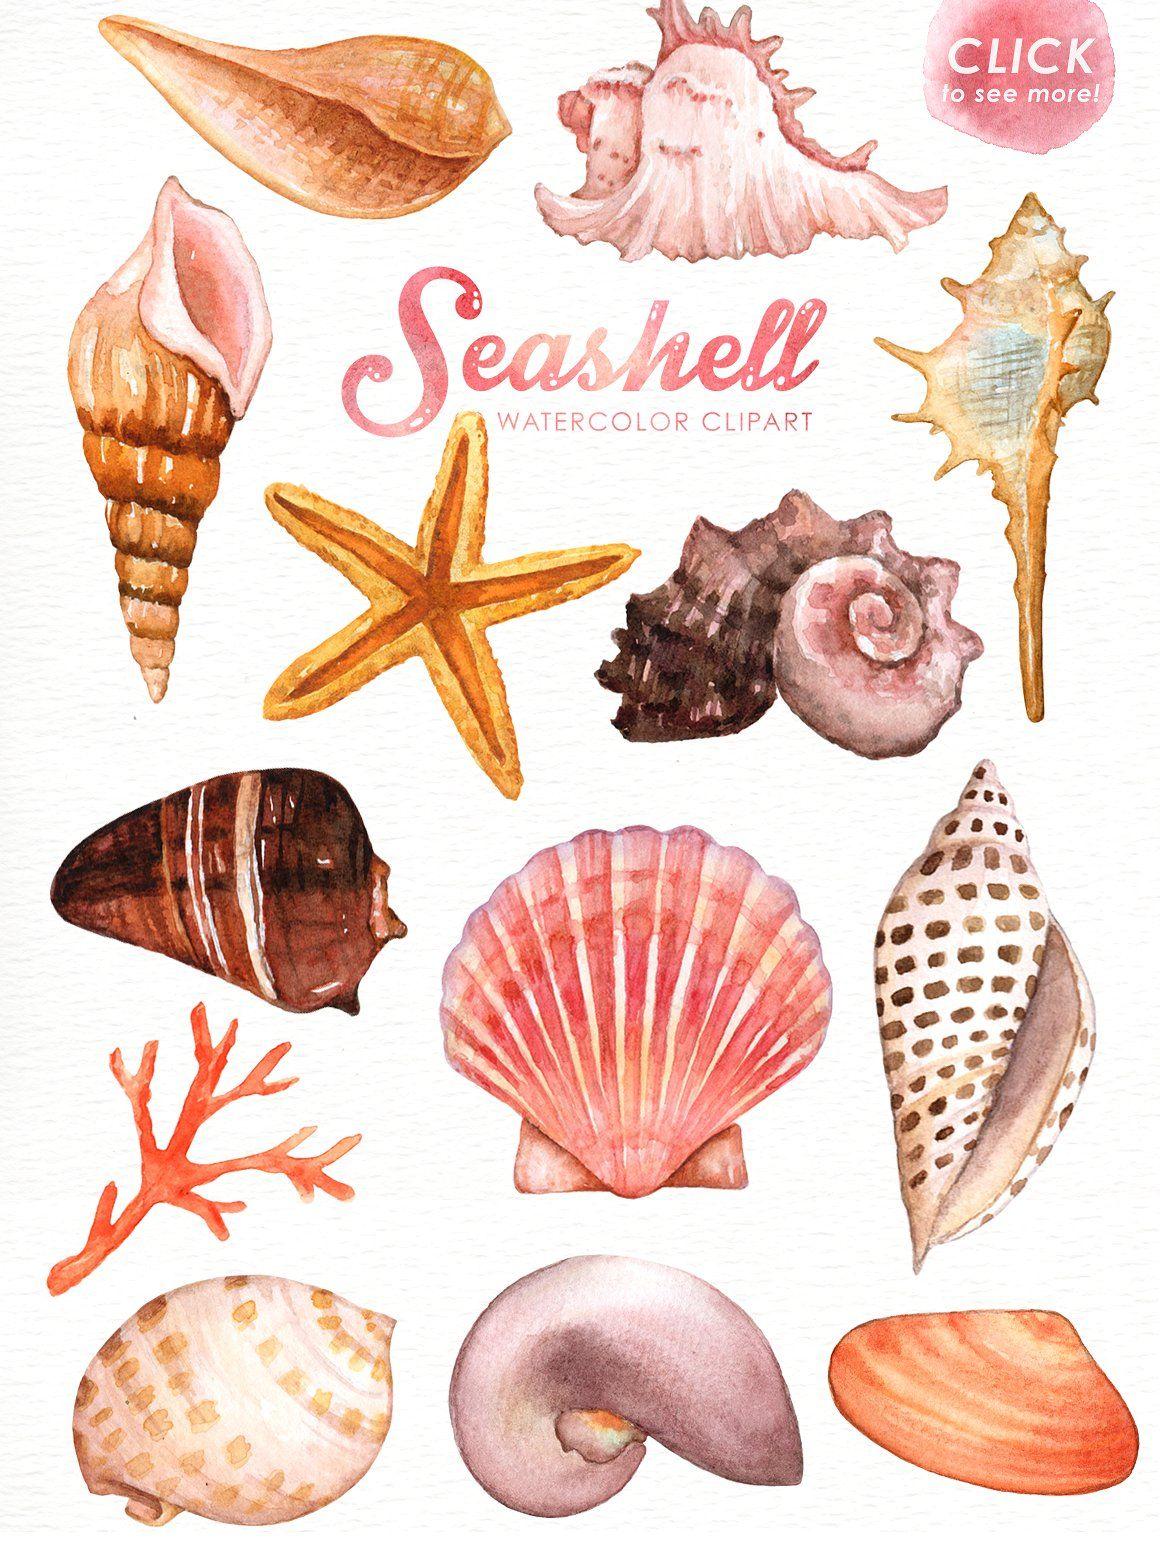 Watercolor seashell clipart